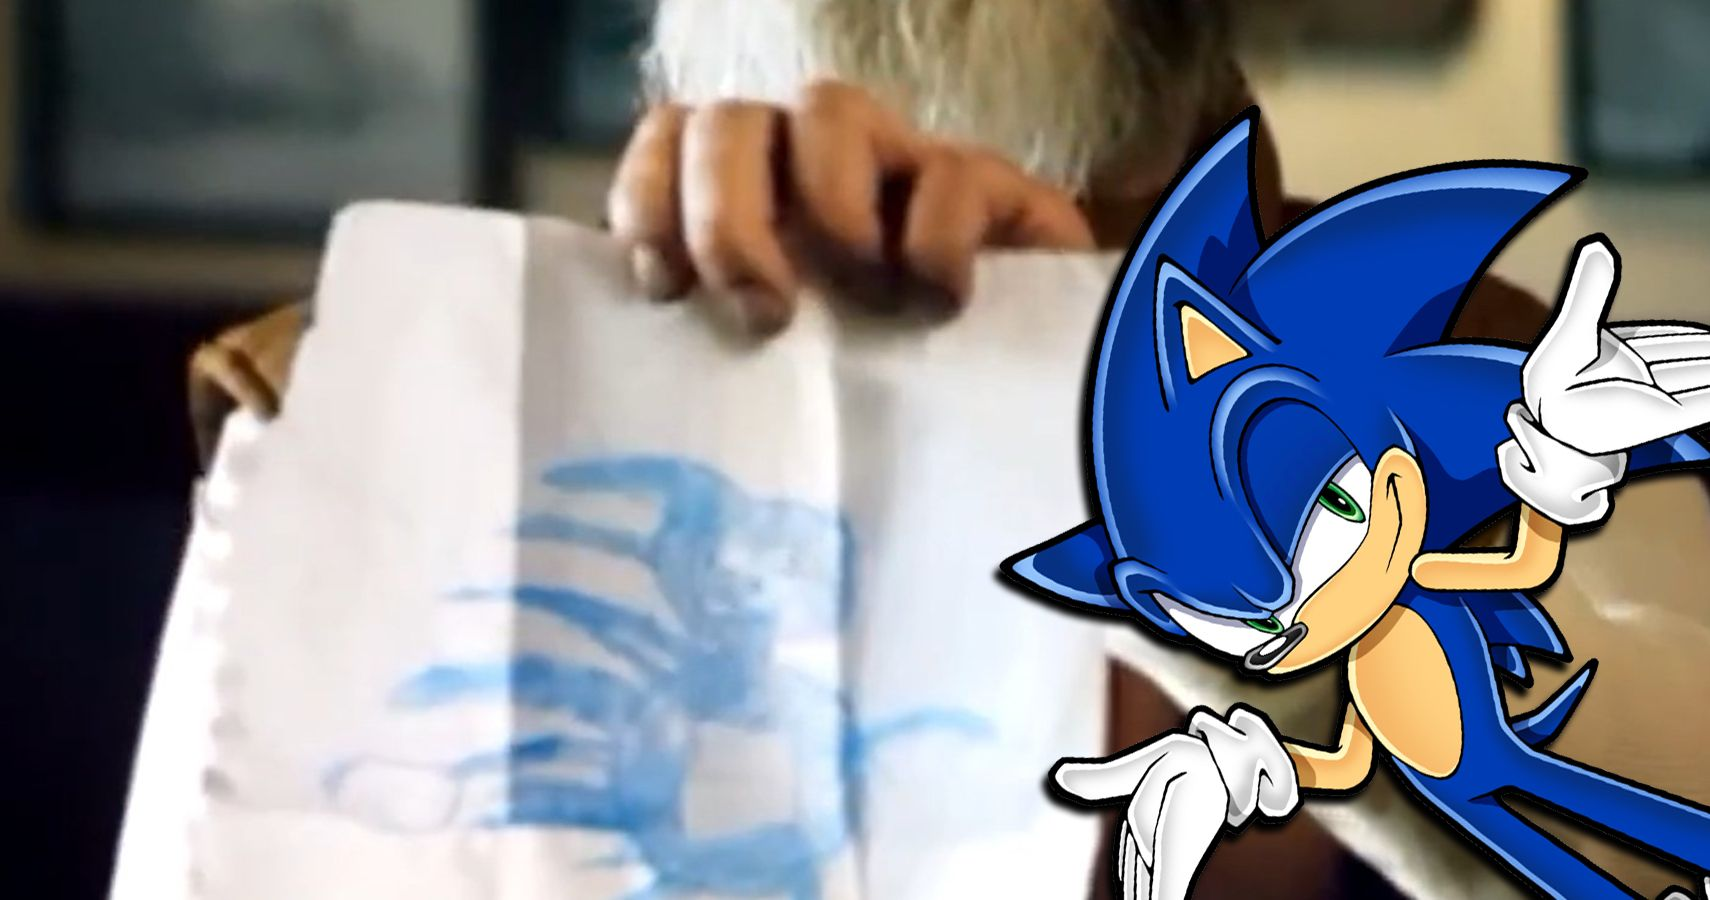 10 Hidden Details Everyone Missed In The Sonic The Hedgehog Movie